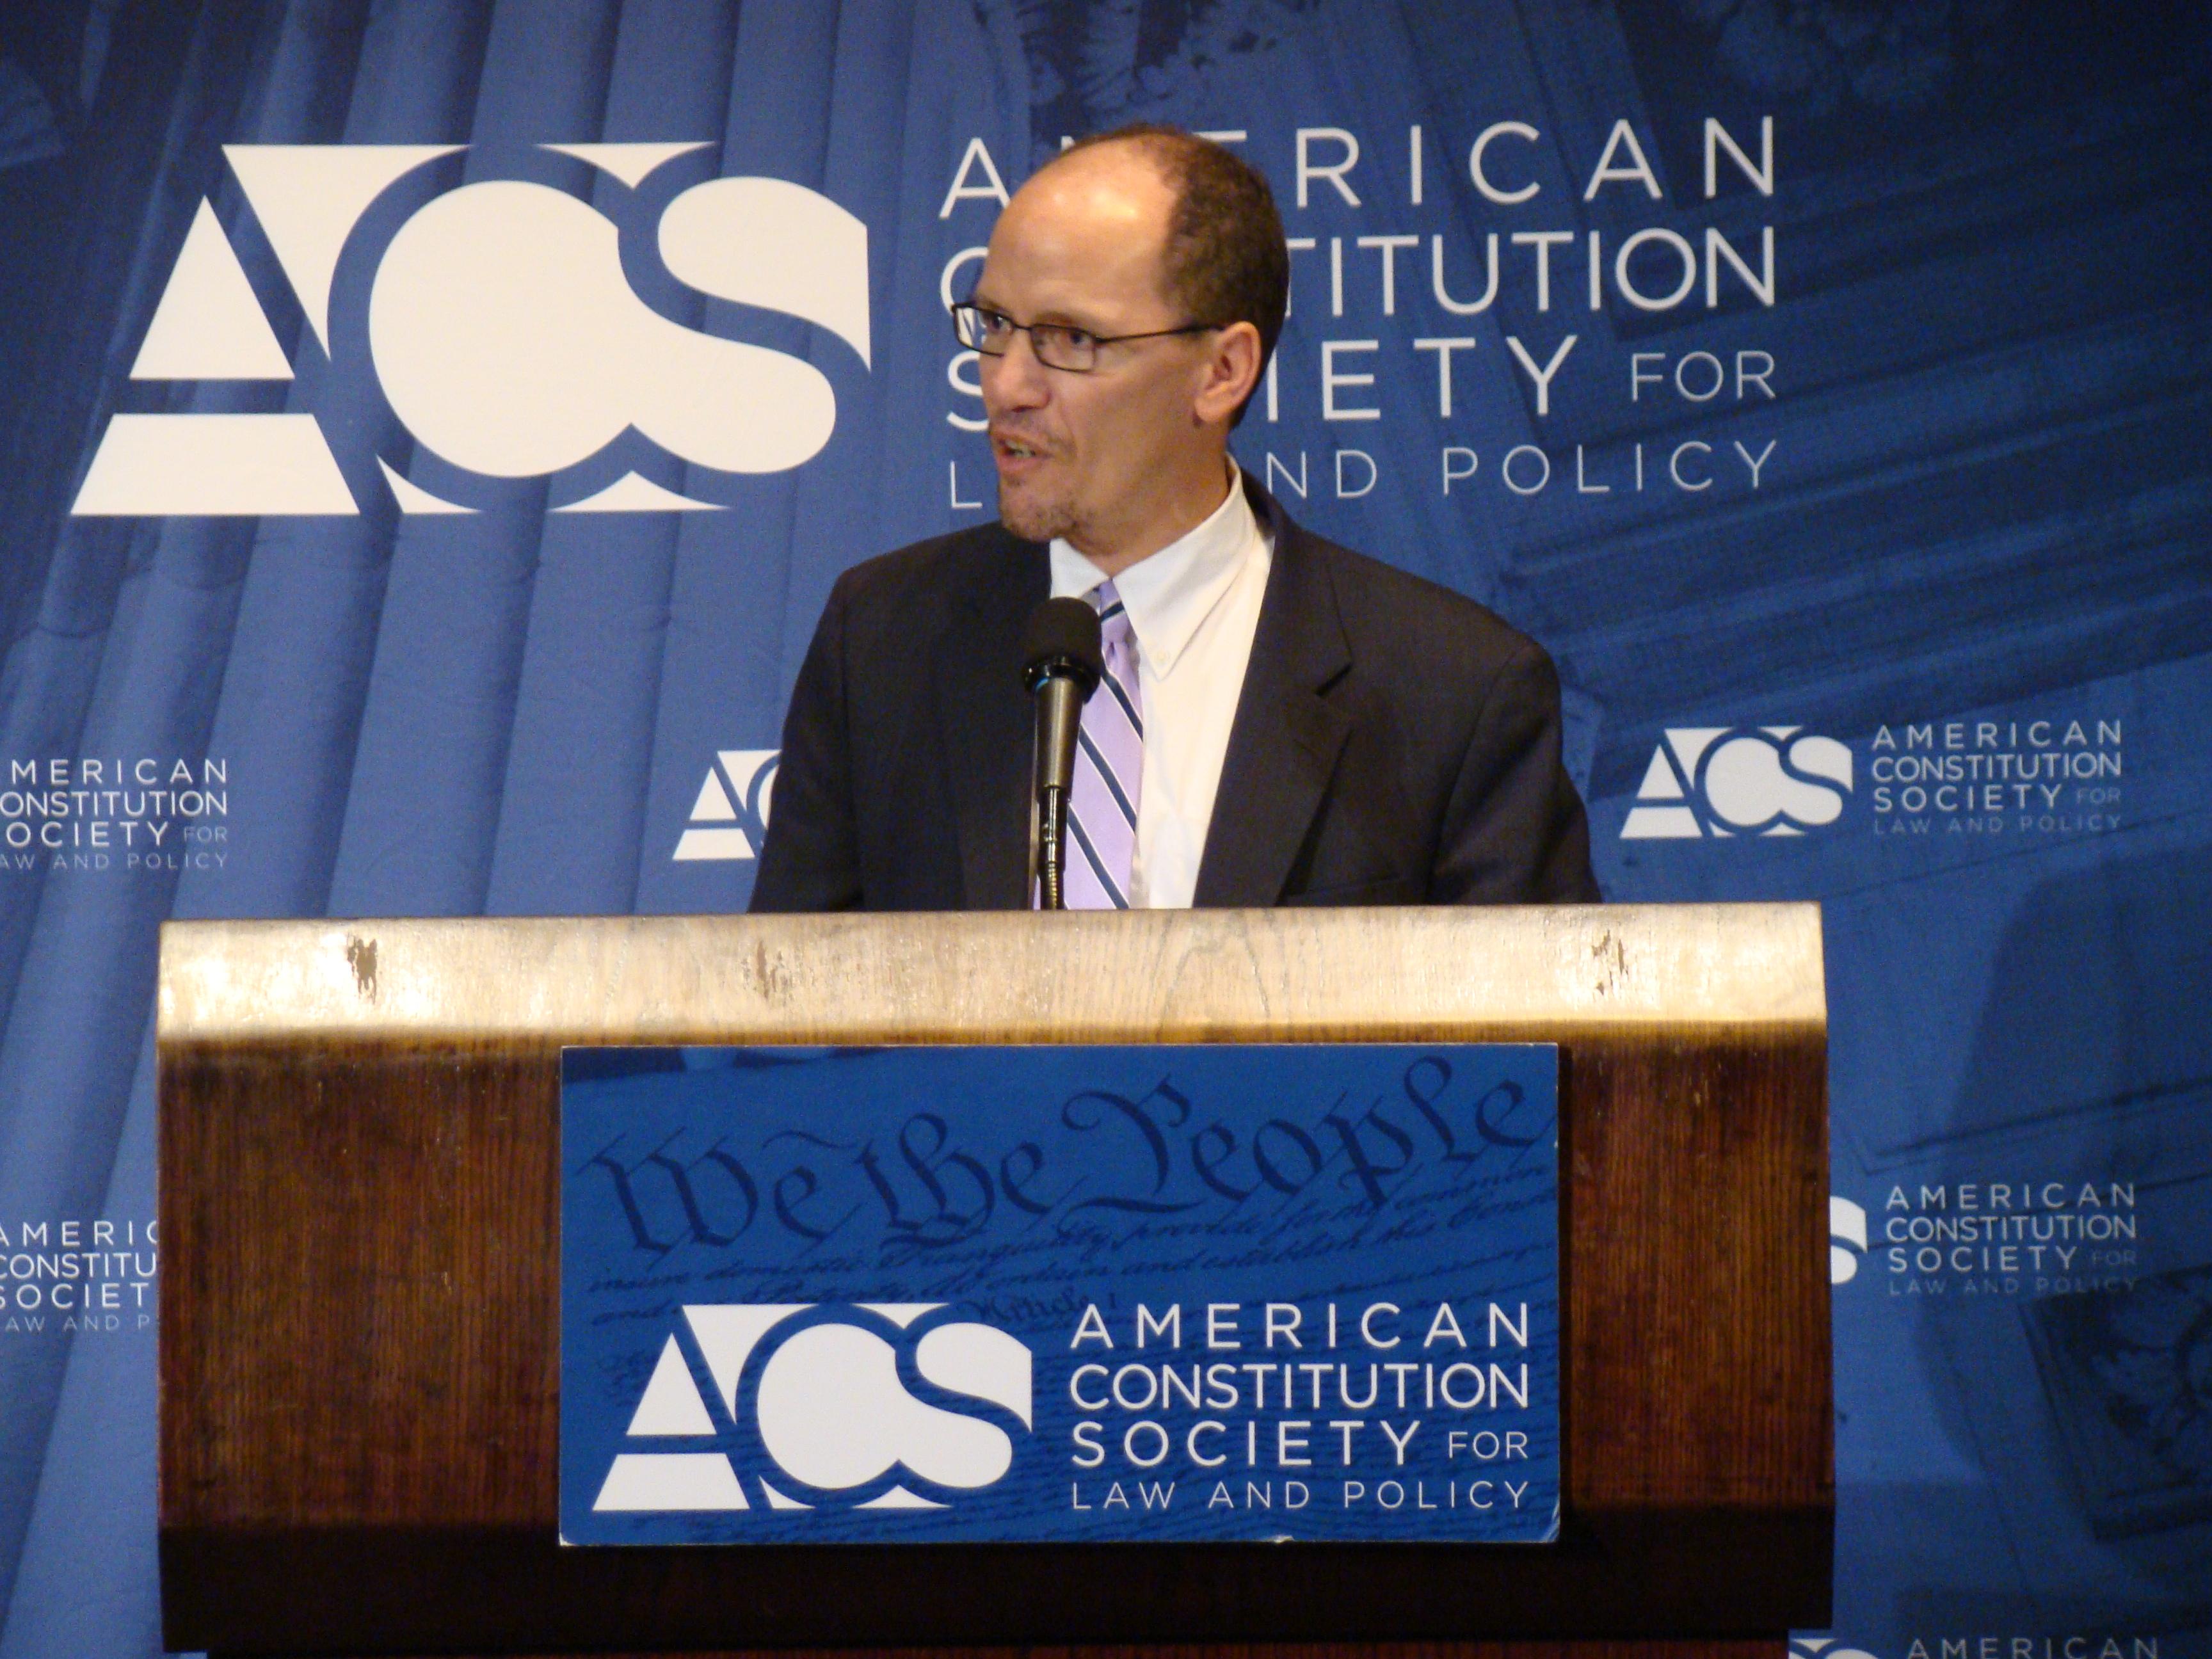 Assistant Attorney General Thomas E. Perez